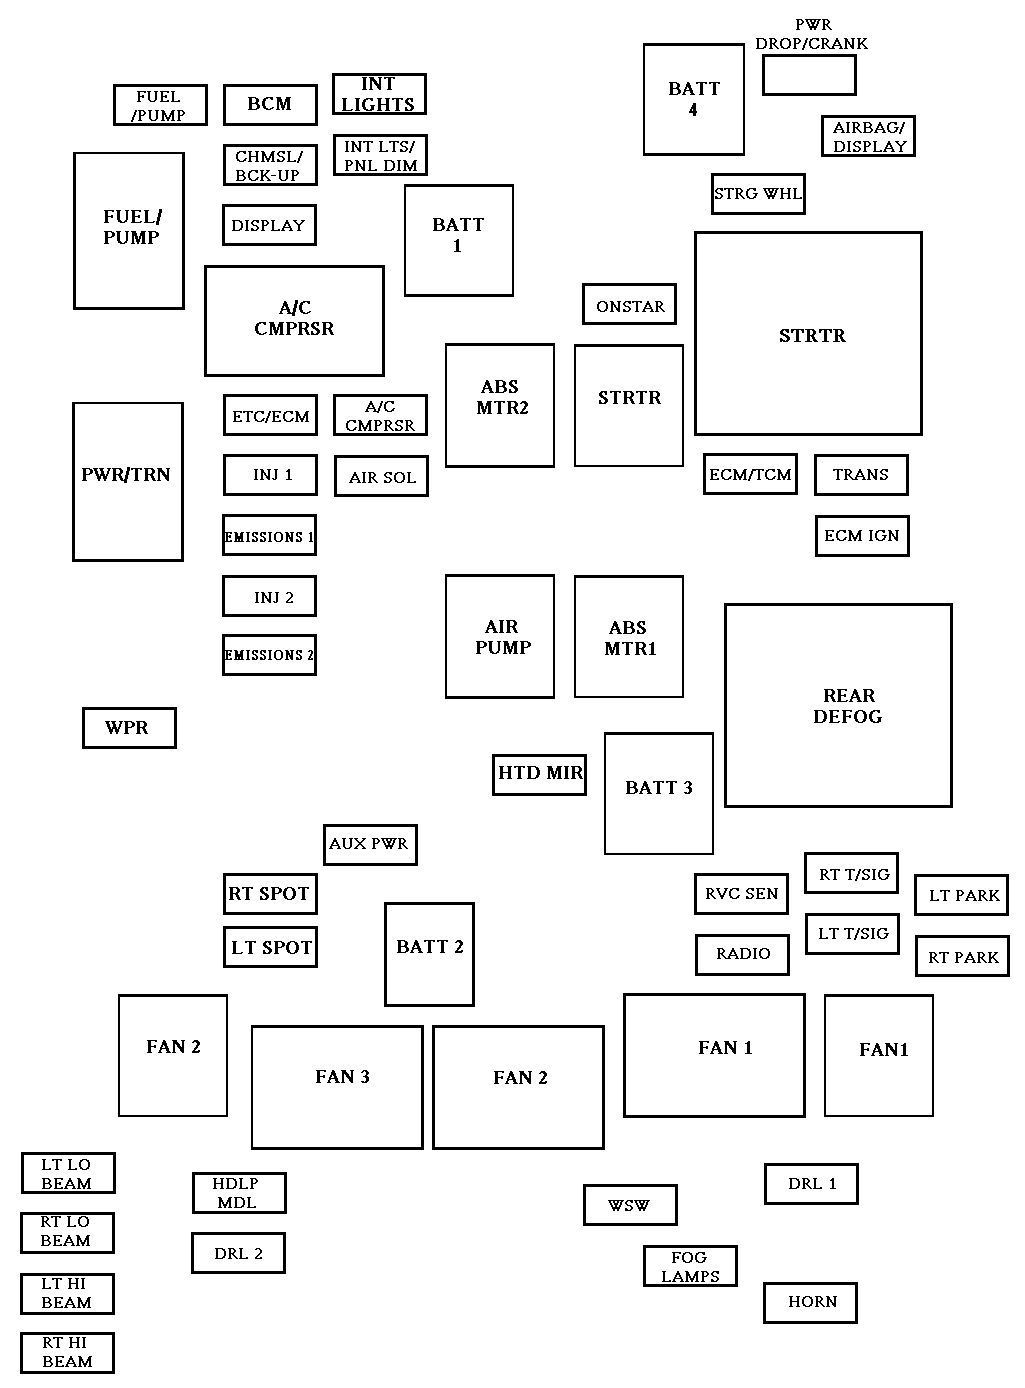 1939 dlc wiring diagram fl70 wiring diagram wiring diagram data  fl70 wiring diagram wiring diagram data